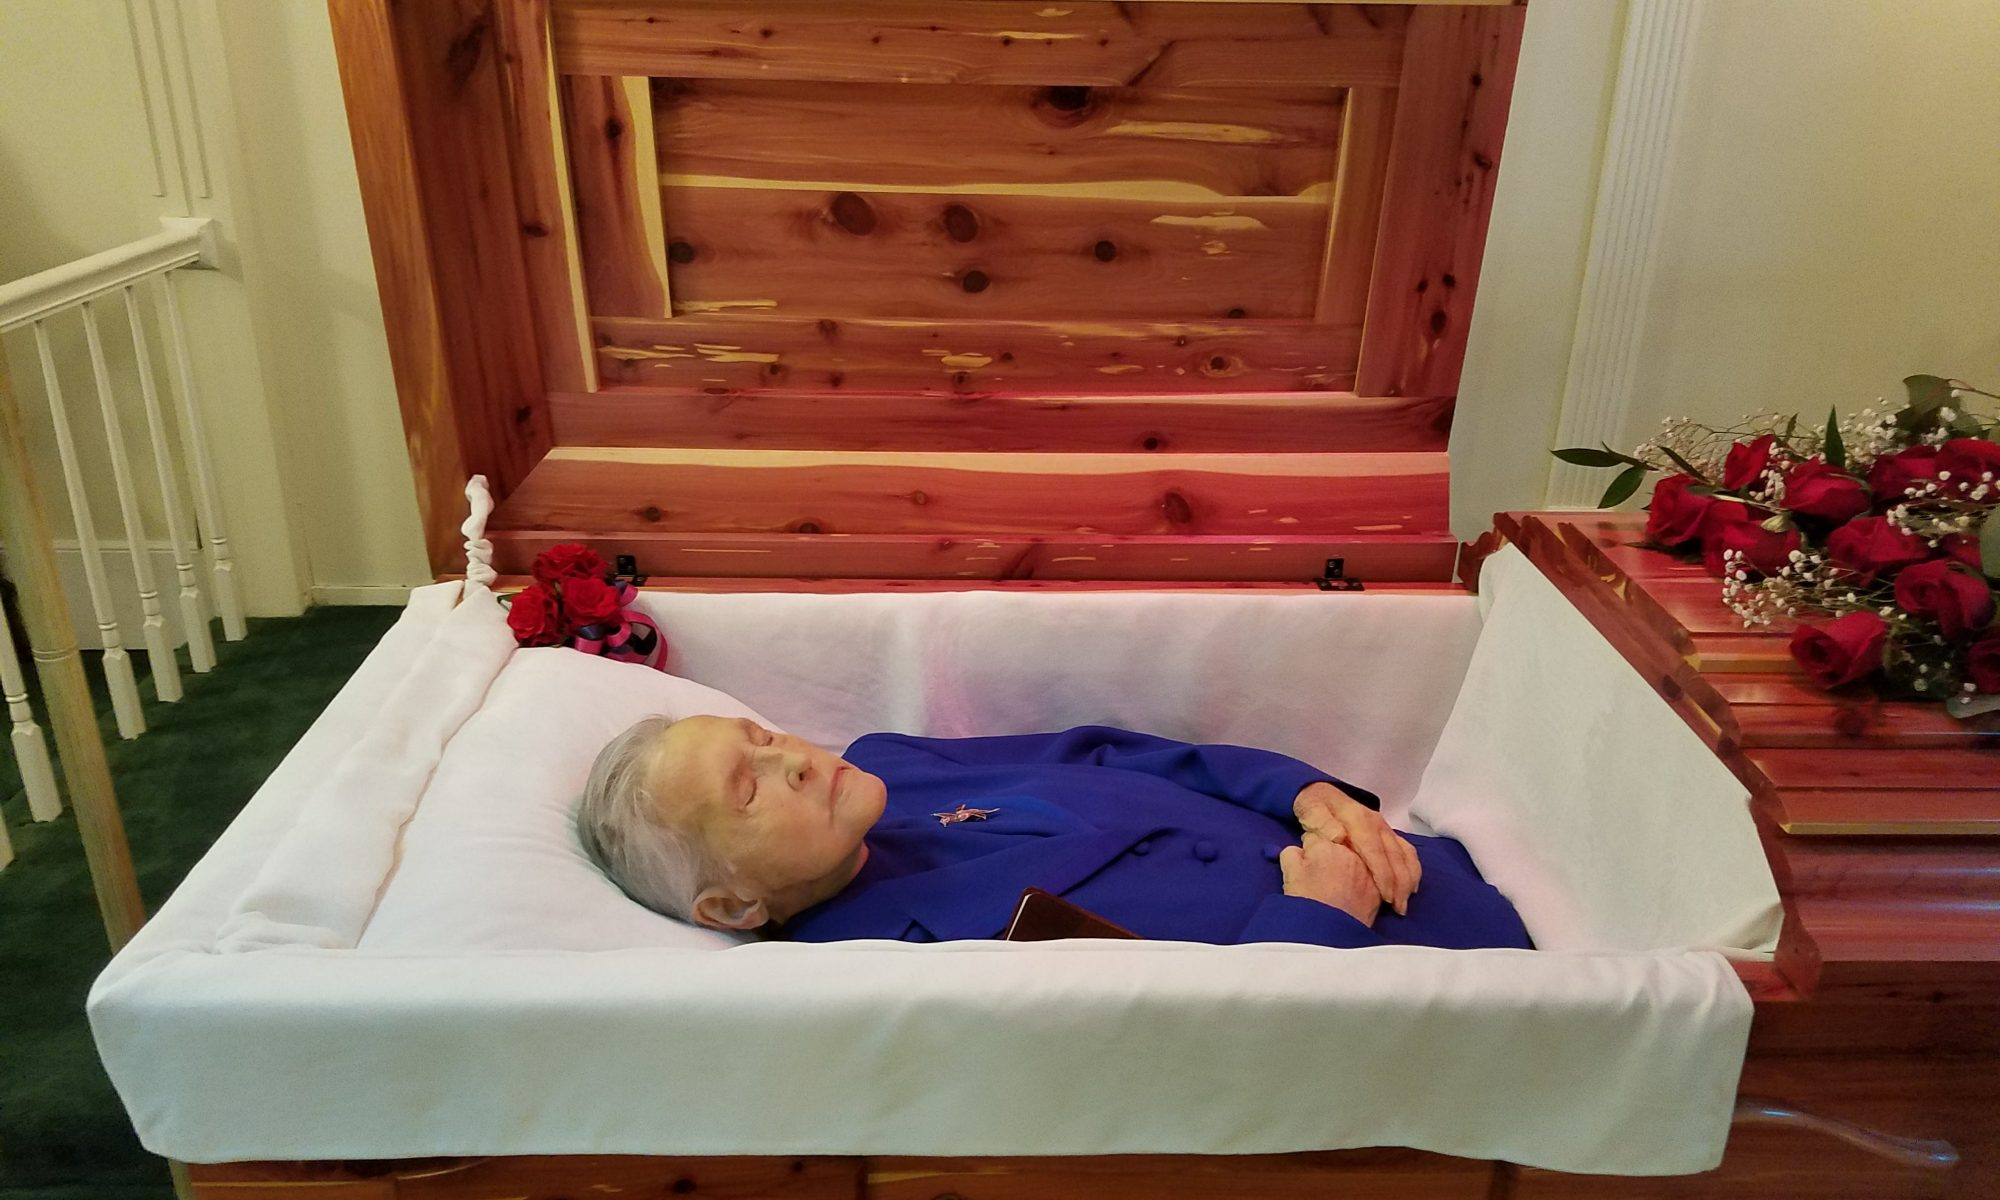 Grandma Huneycutt